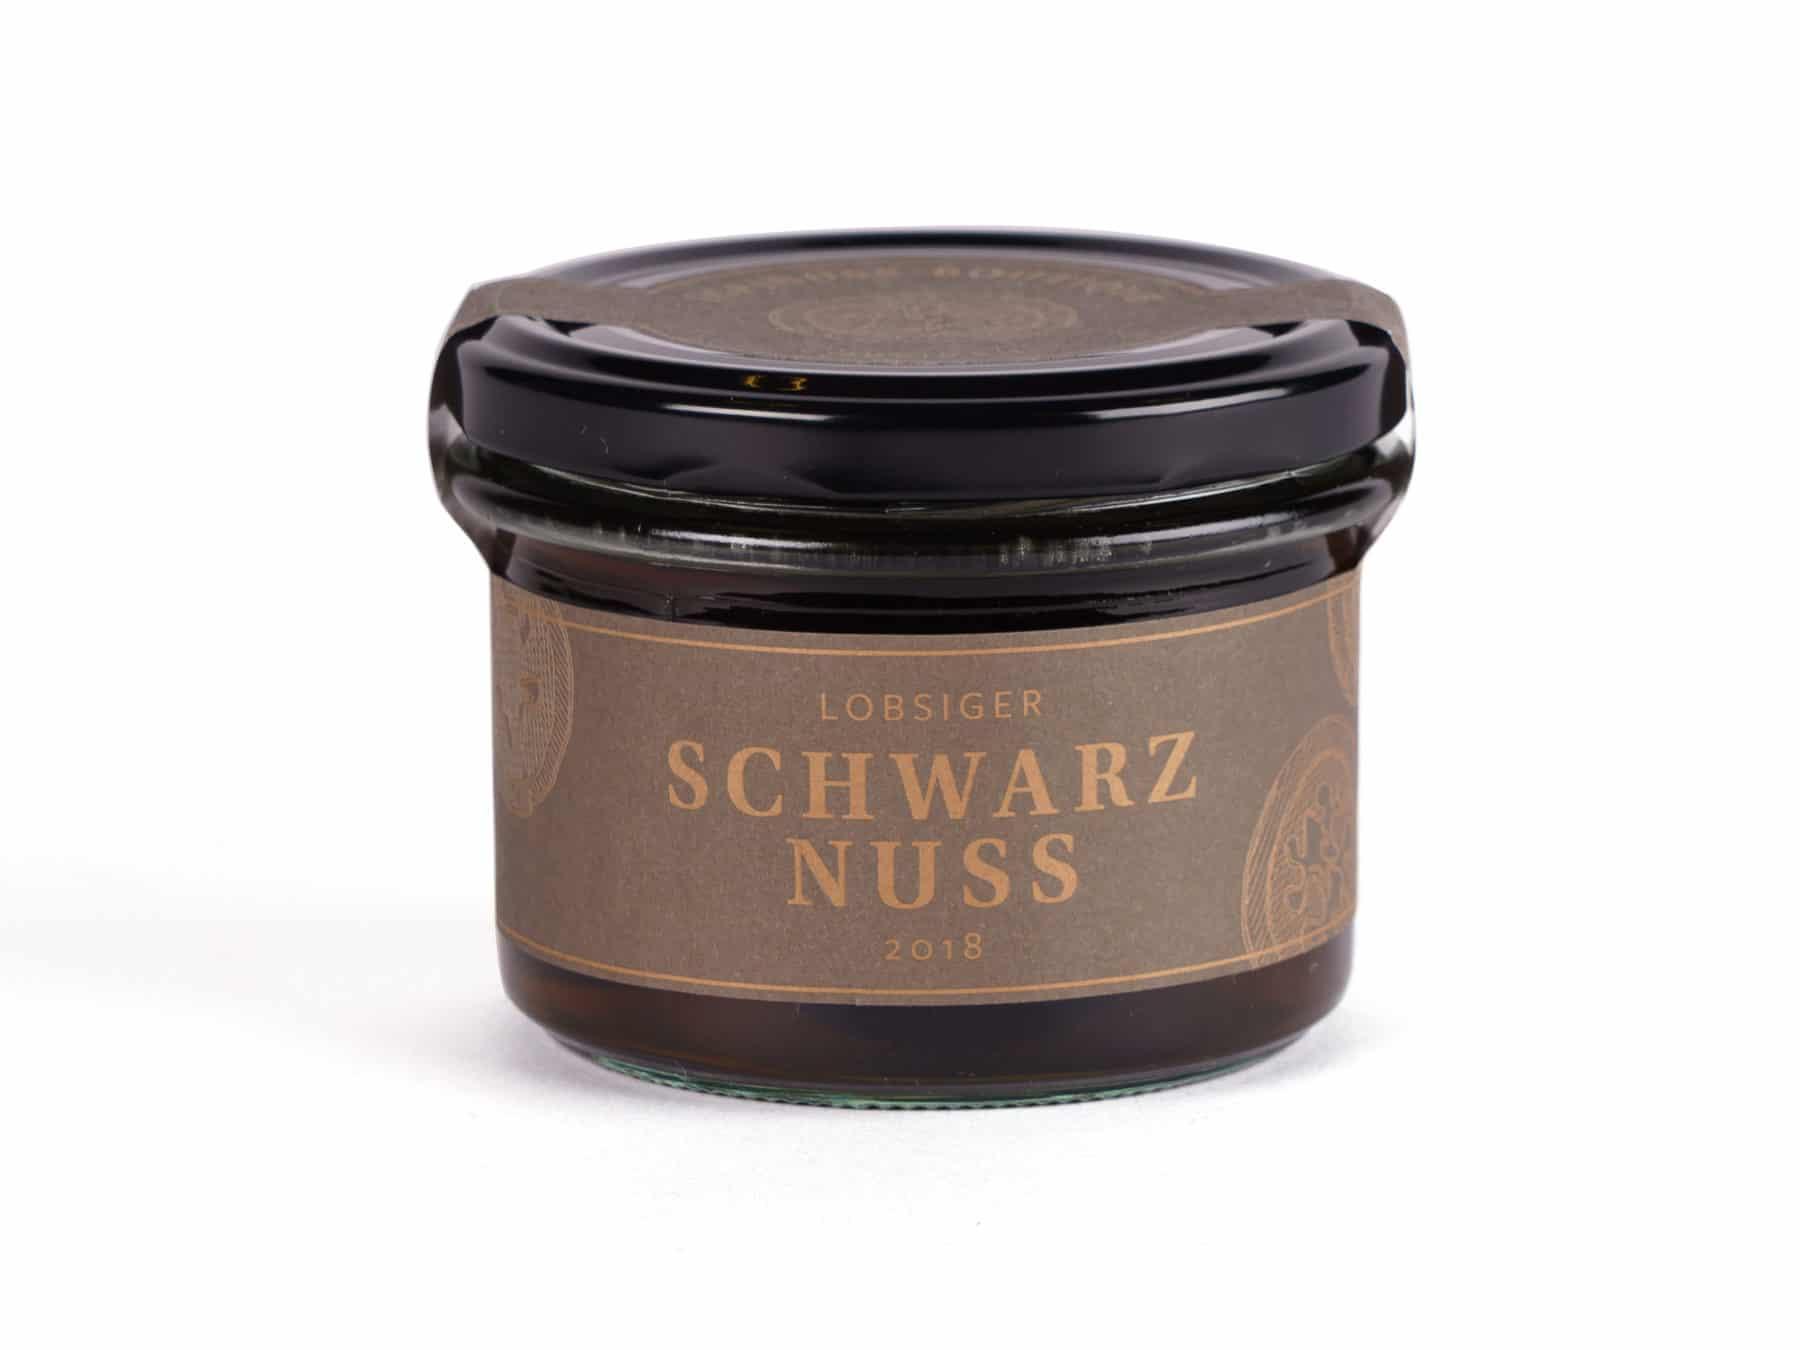 Lobsiger Schwarznuss Schweizer Gourmet Delikatesse ideal zu Kaese